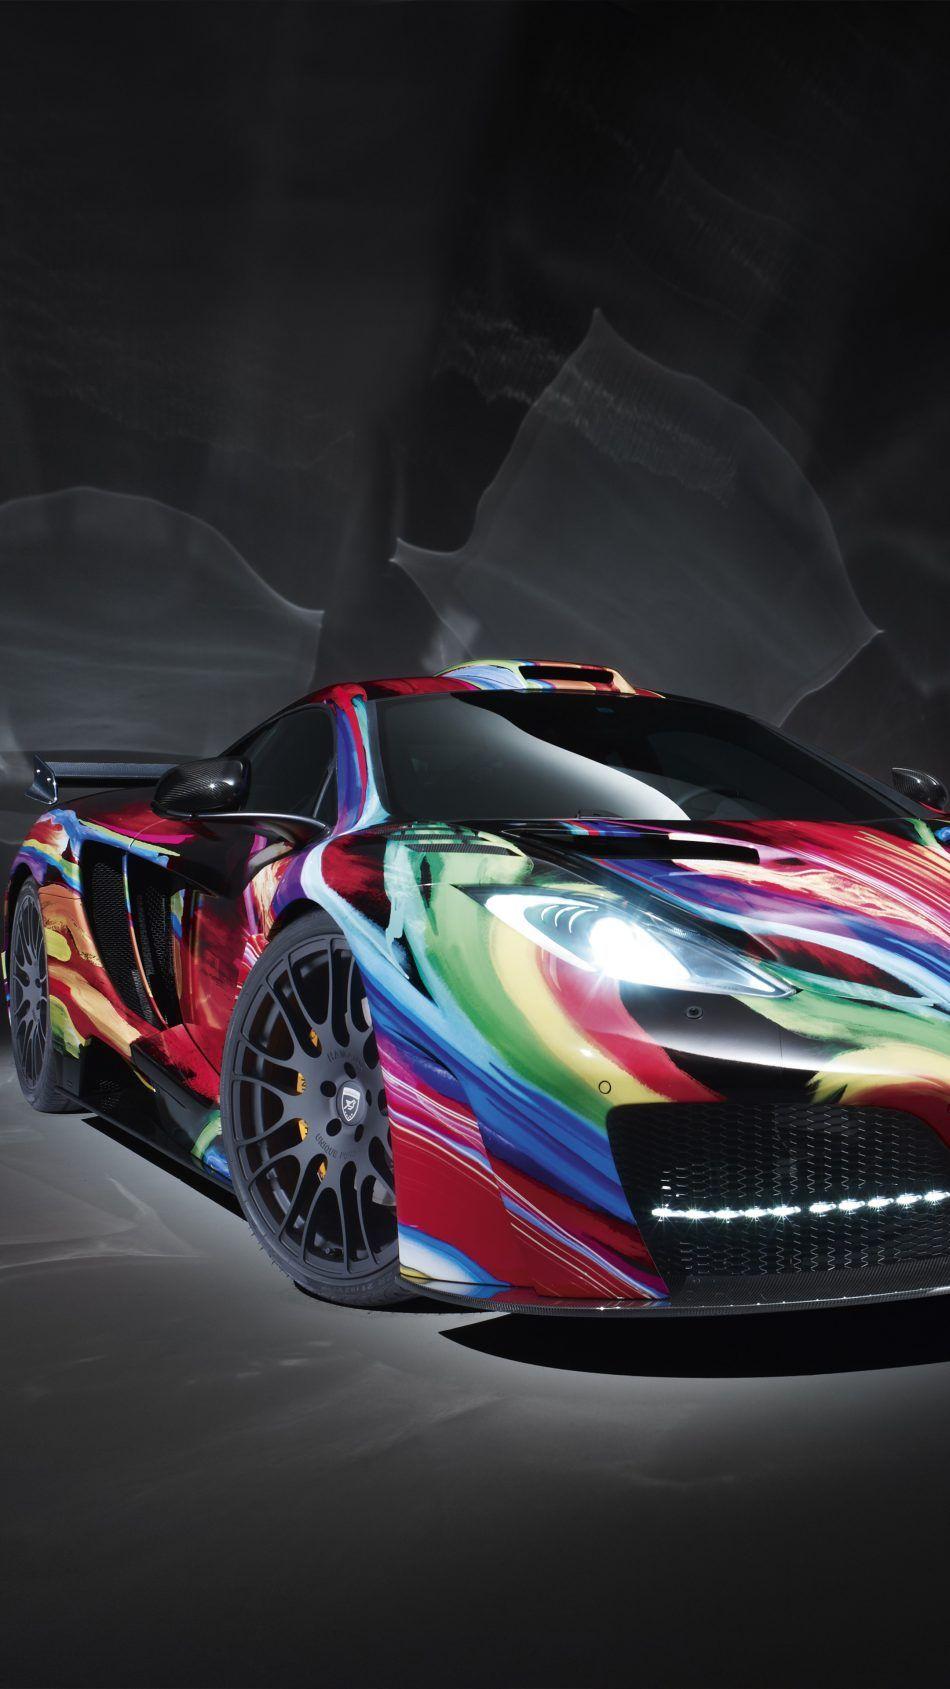 Hamann Memor Colorful Dark Background 4k Ultra Hd Mobile Wallpaper Cool Car Pictures Car Wallpapers Car